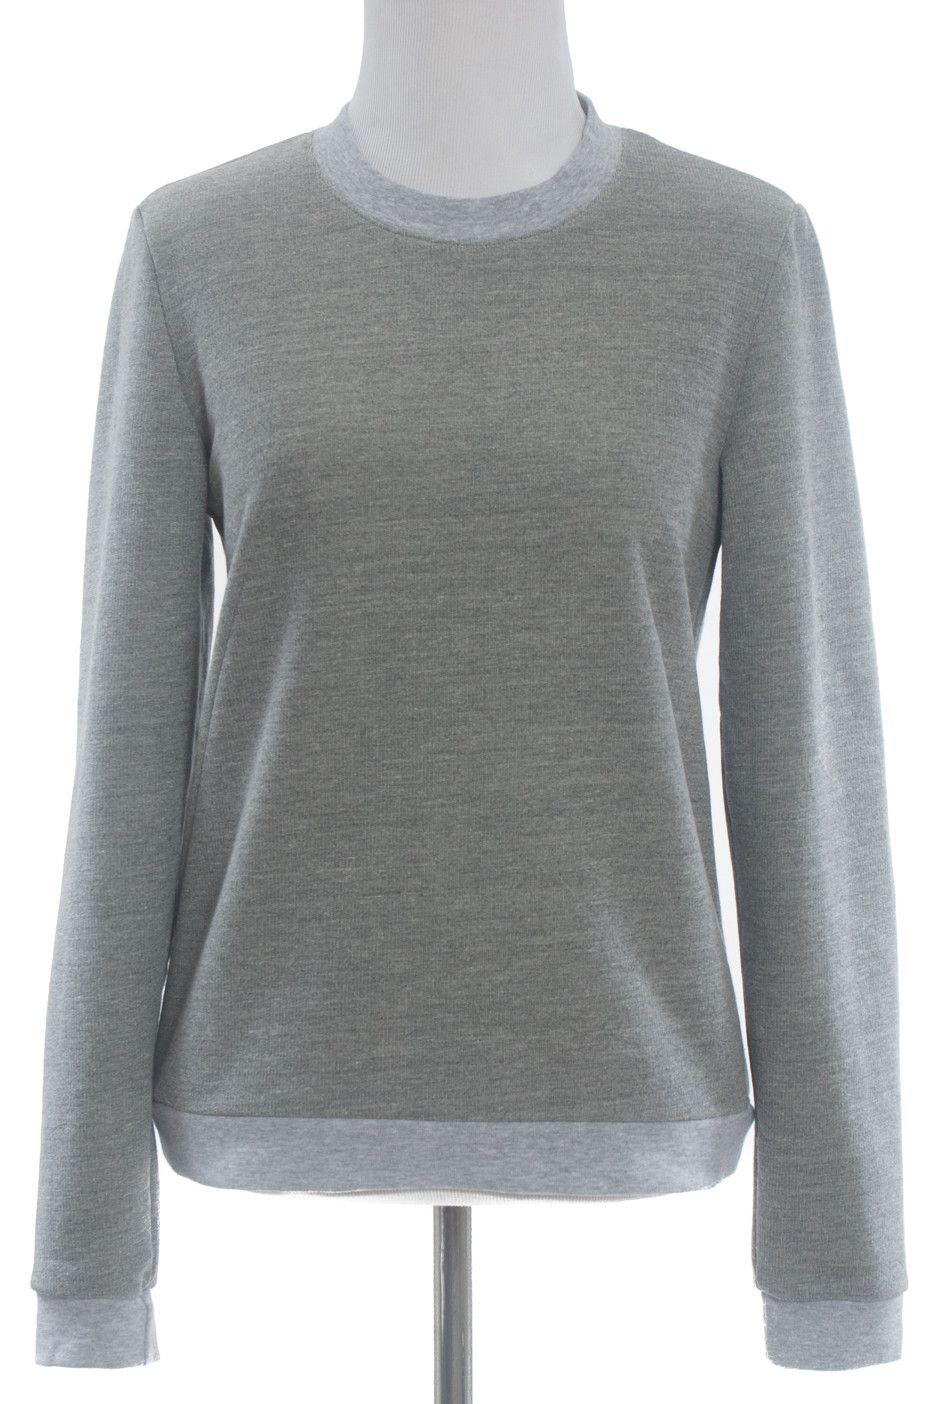 Sloane Sweatshirt Sewing Pattern by Named Clothing | Nähen